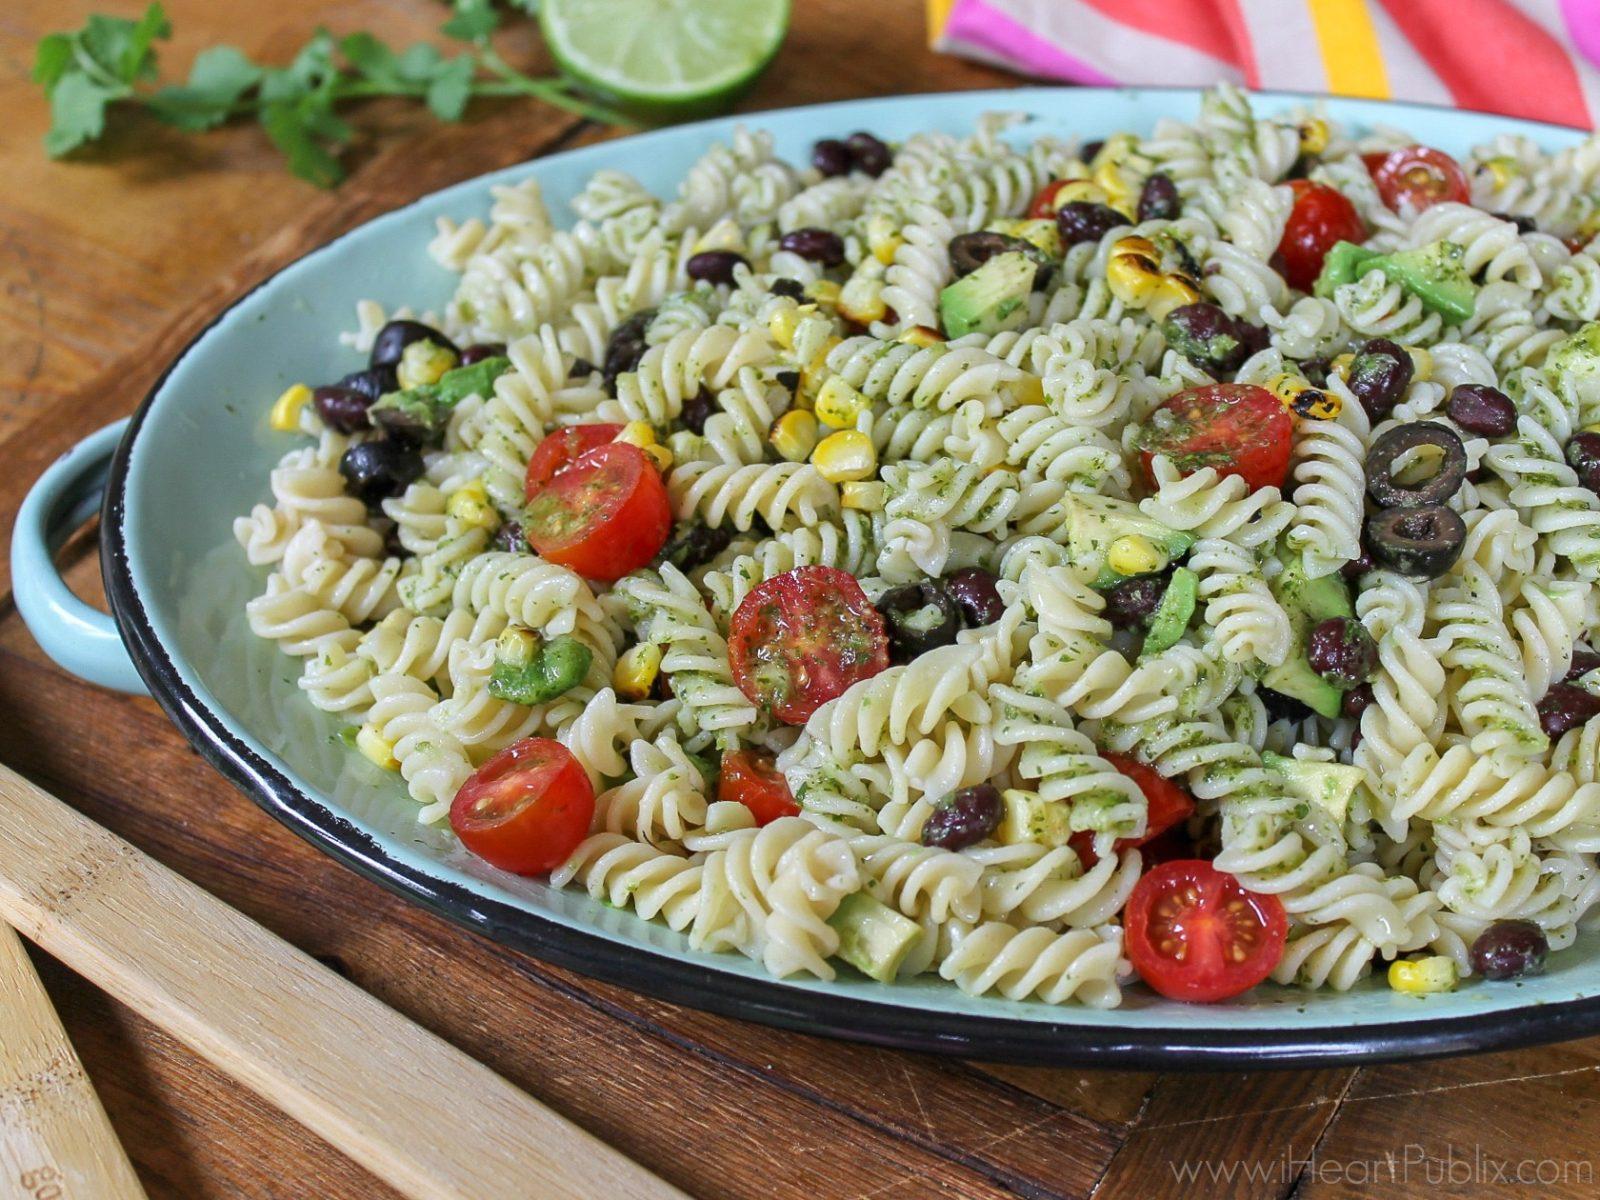 Gluten Free Lime Cilantro Southwestern Pasta Salad on I Heart Publix